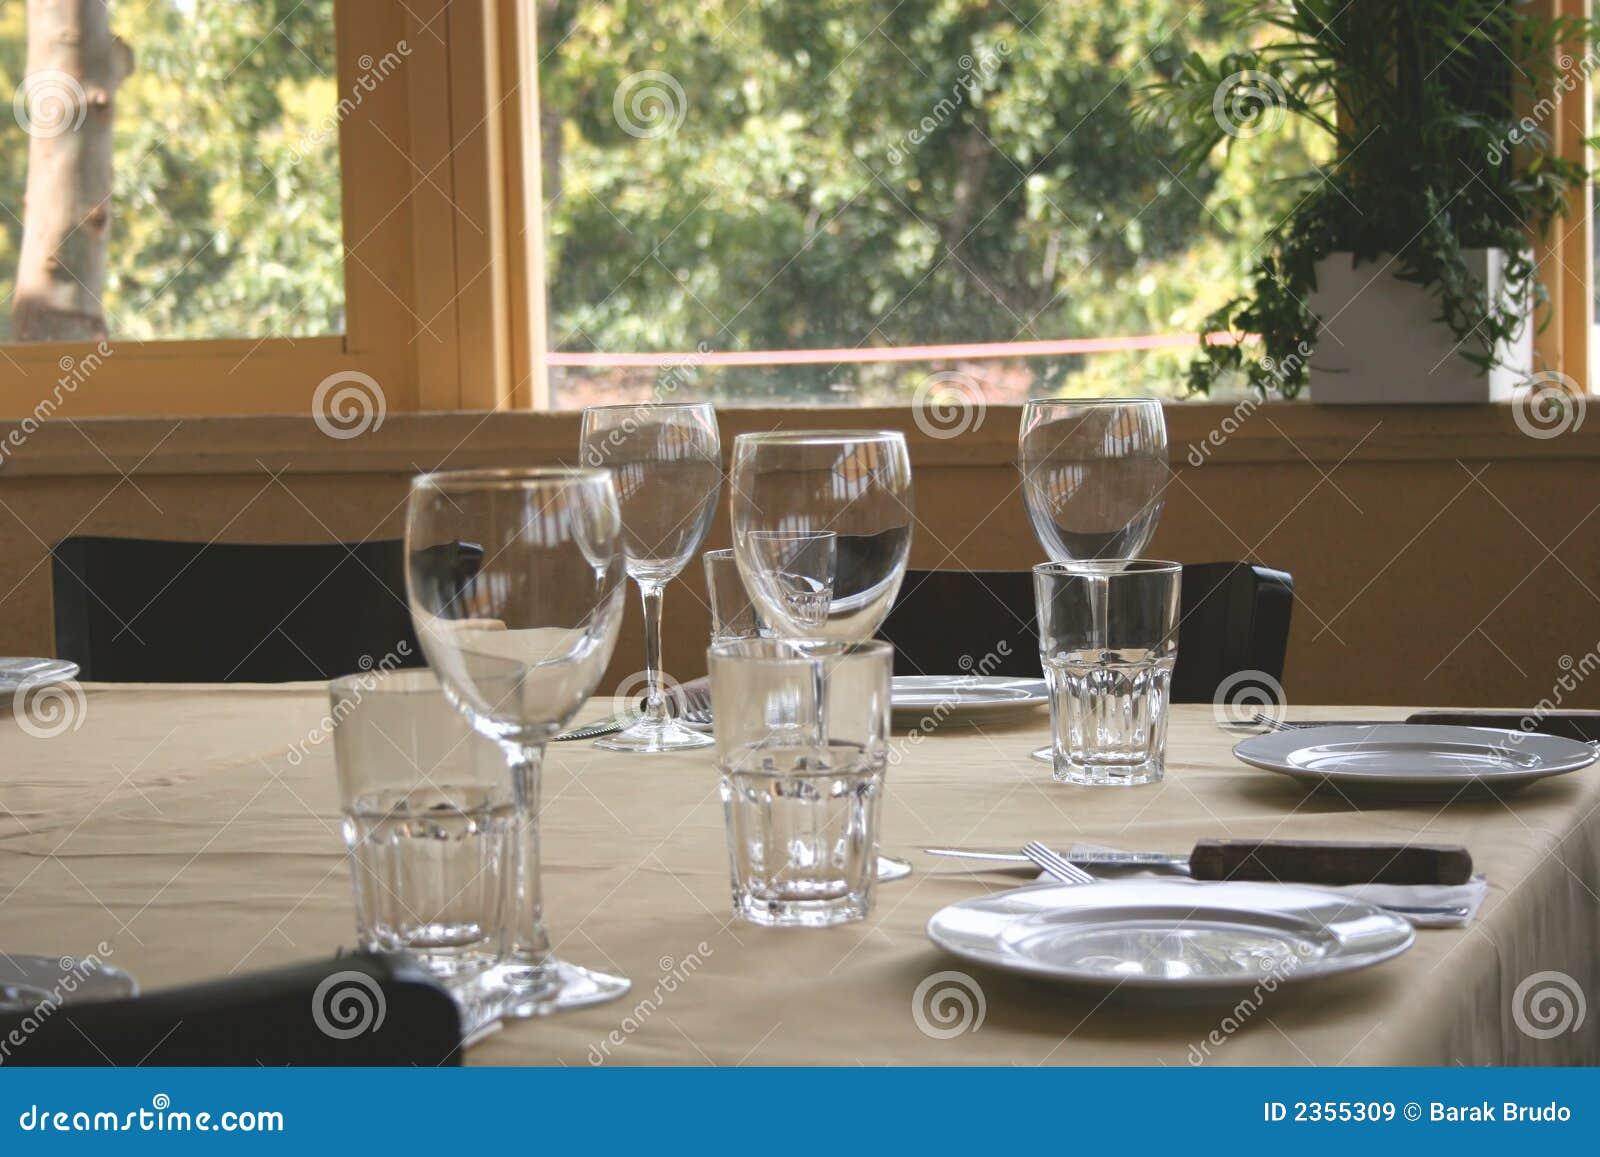 Tableau de restaurant